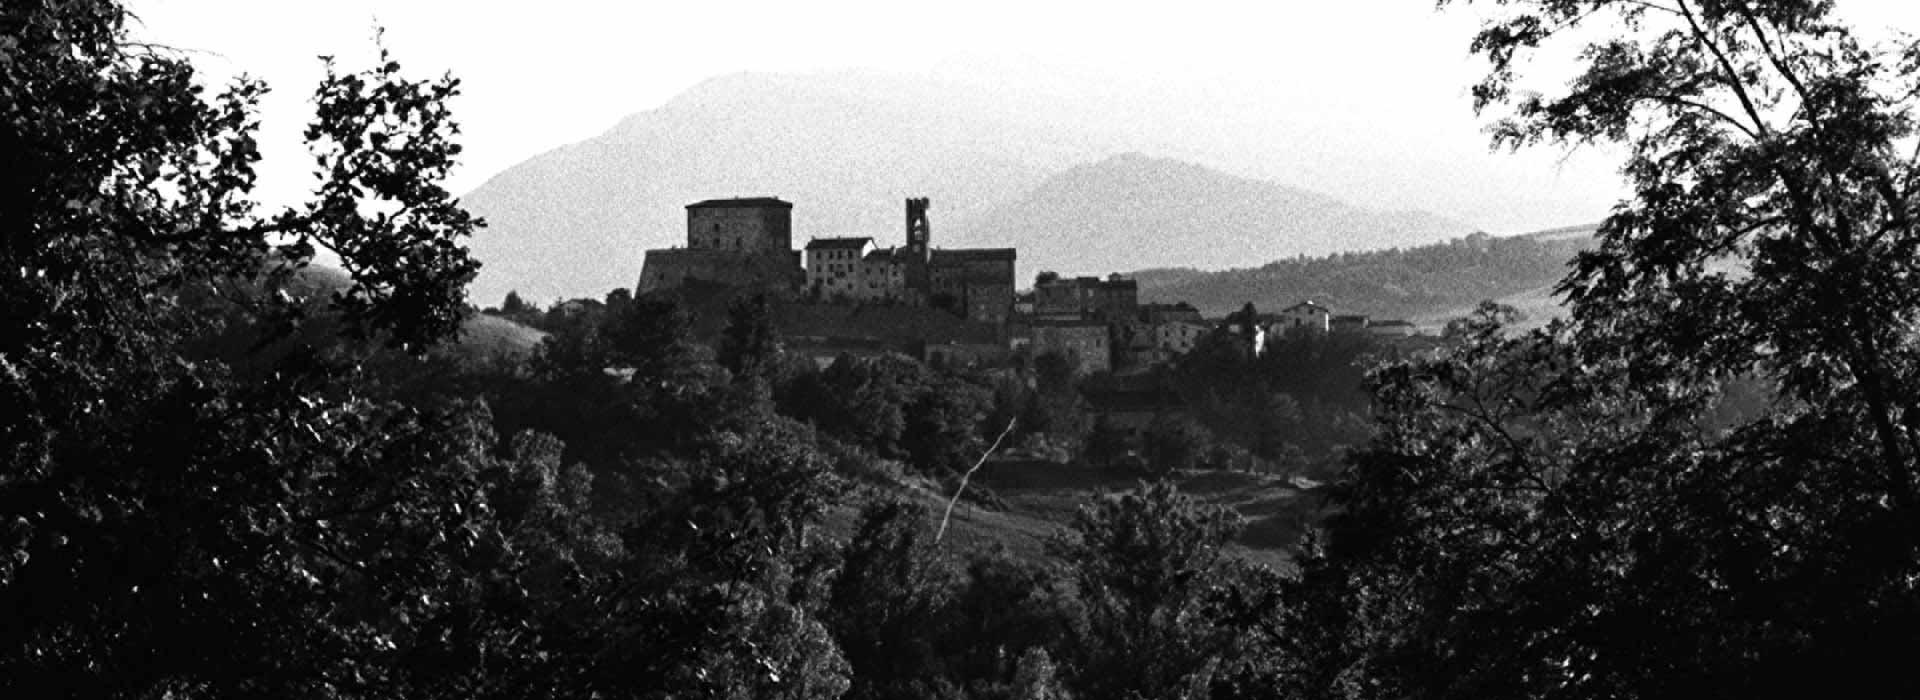 montefeltro-montecerignone